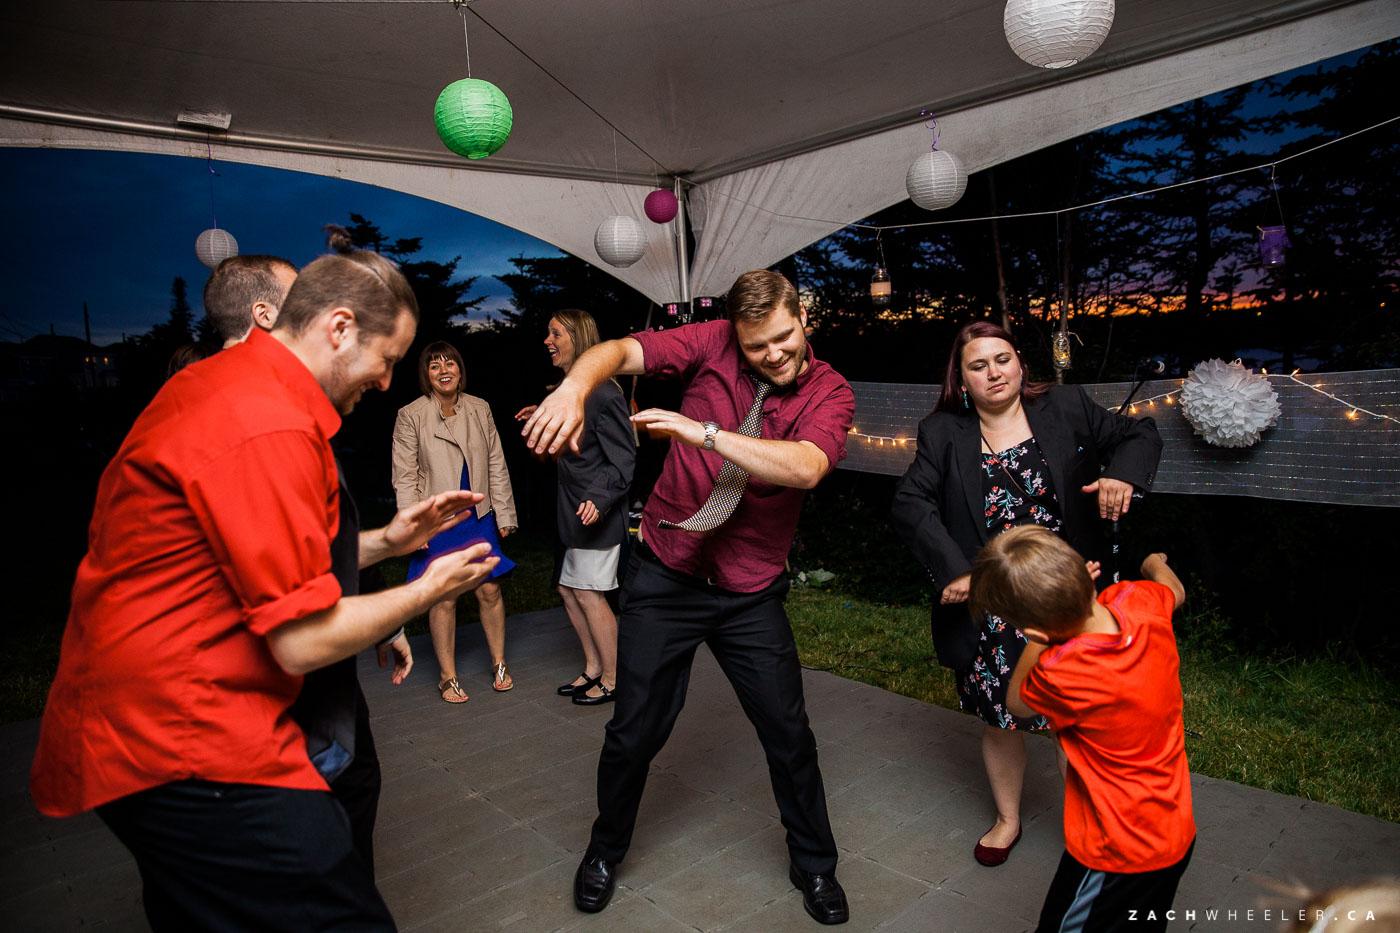 StJohns-Newfoundland-Backyard-Wedding-40